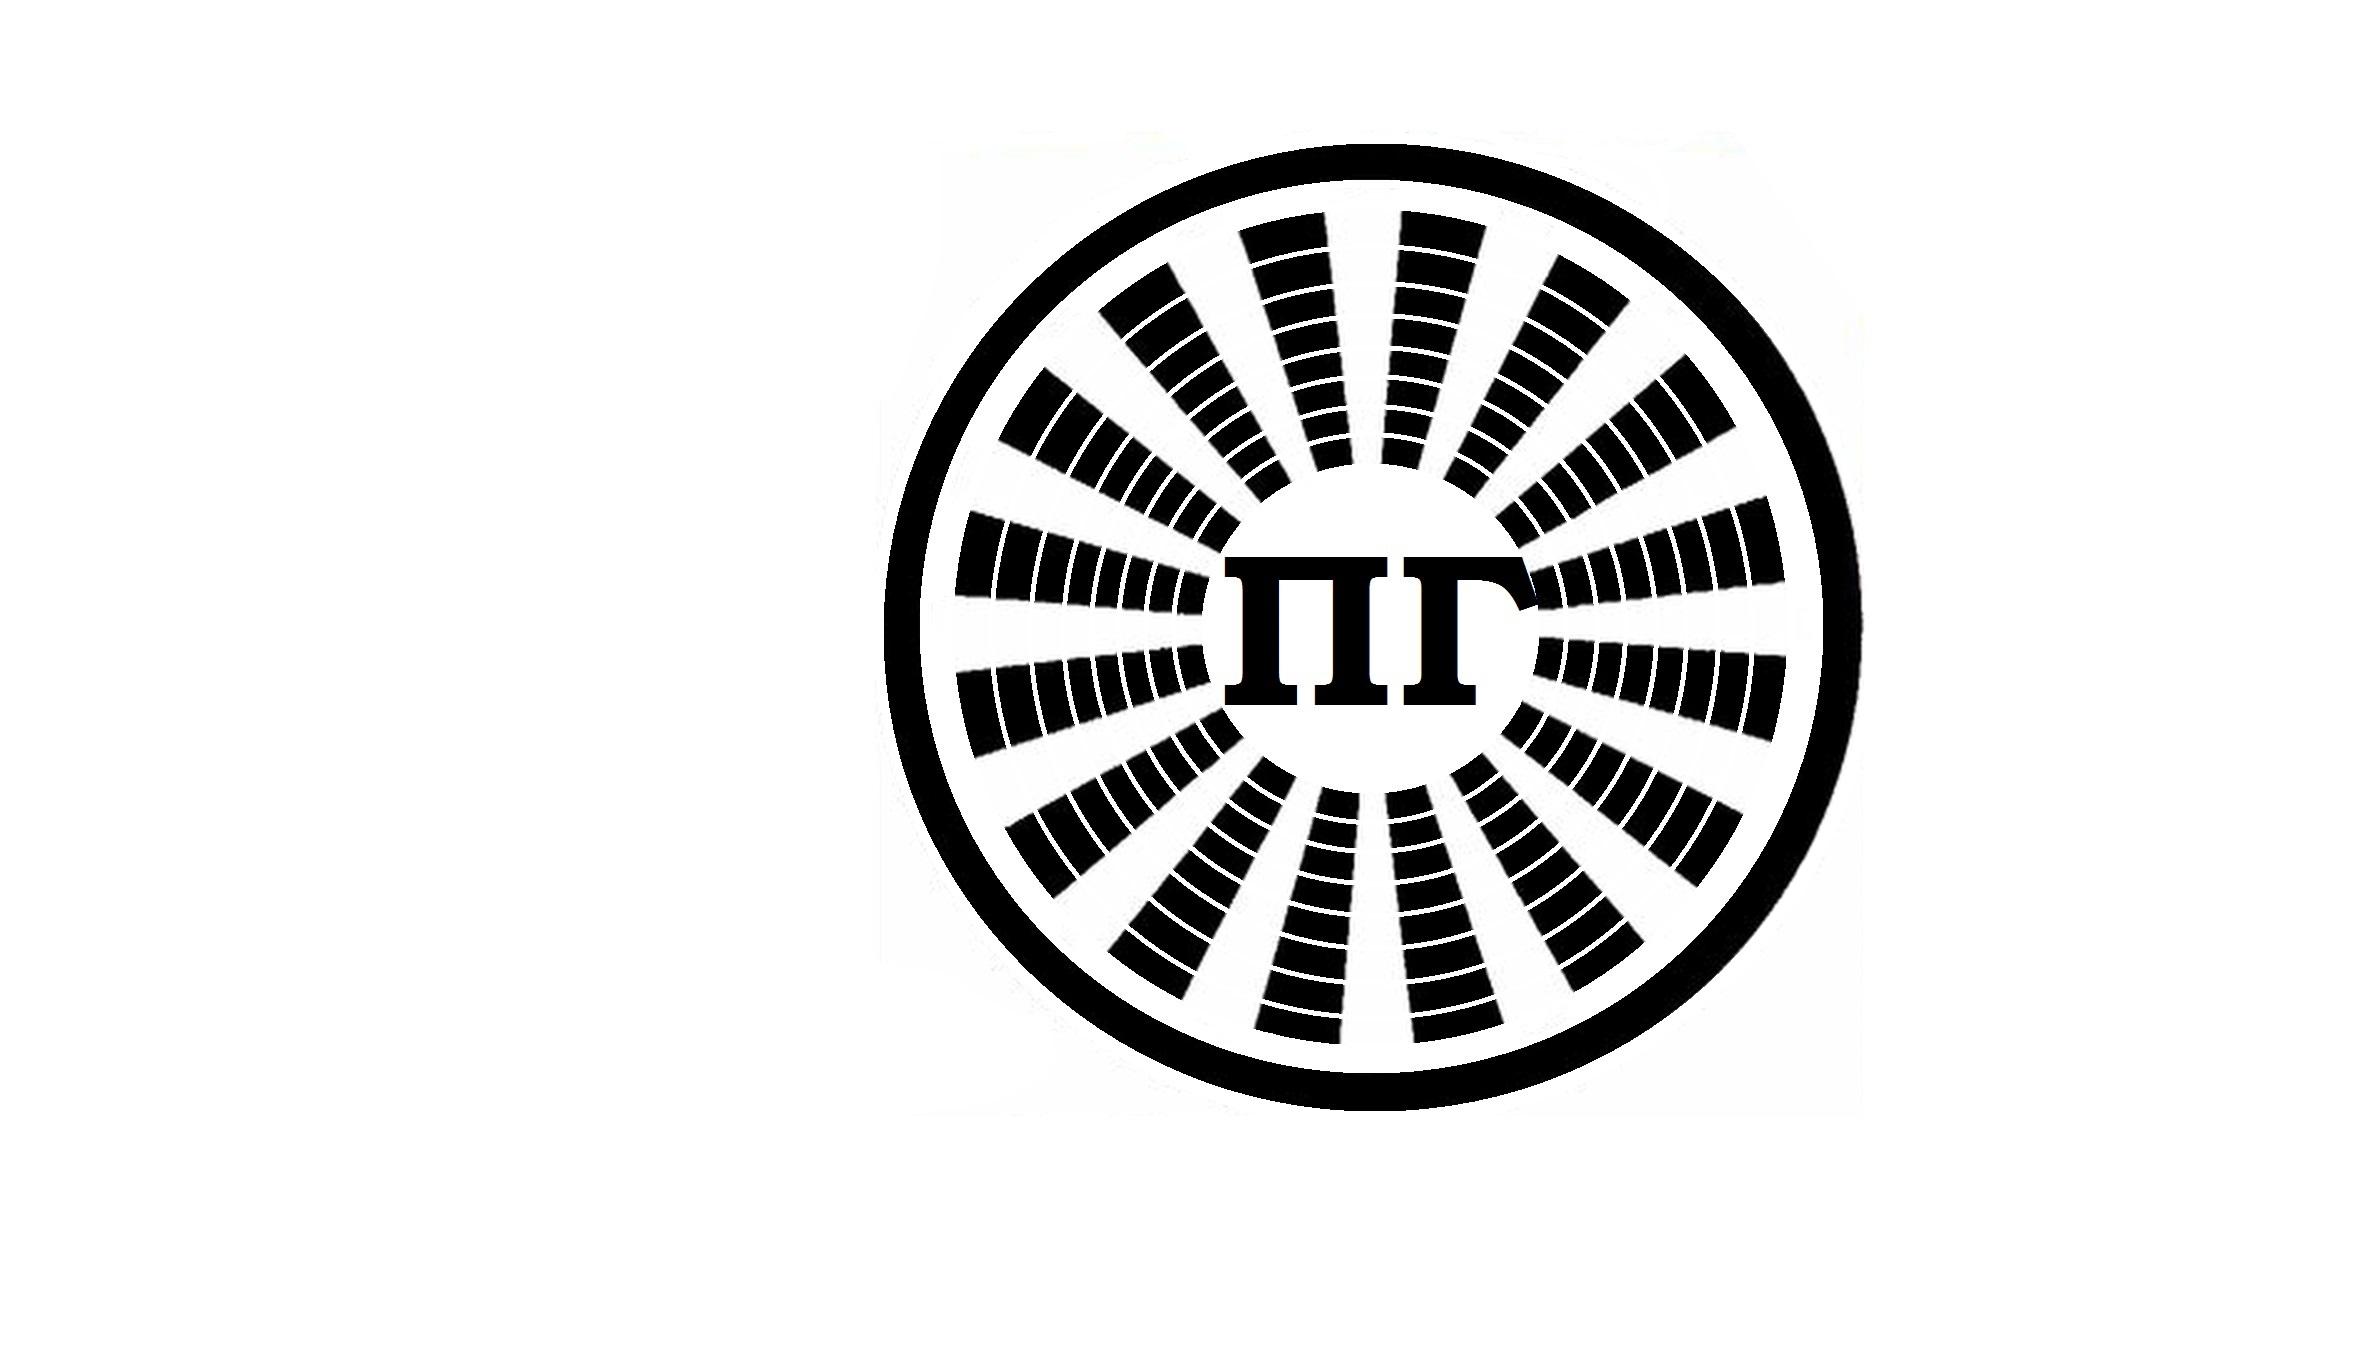 Логотип для Крафтовой Пивоварни фото f_4995cadbb4d4315a.jpg